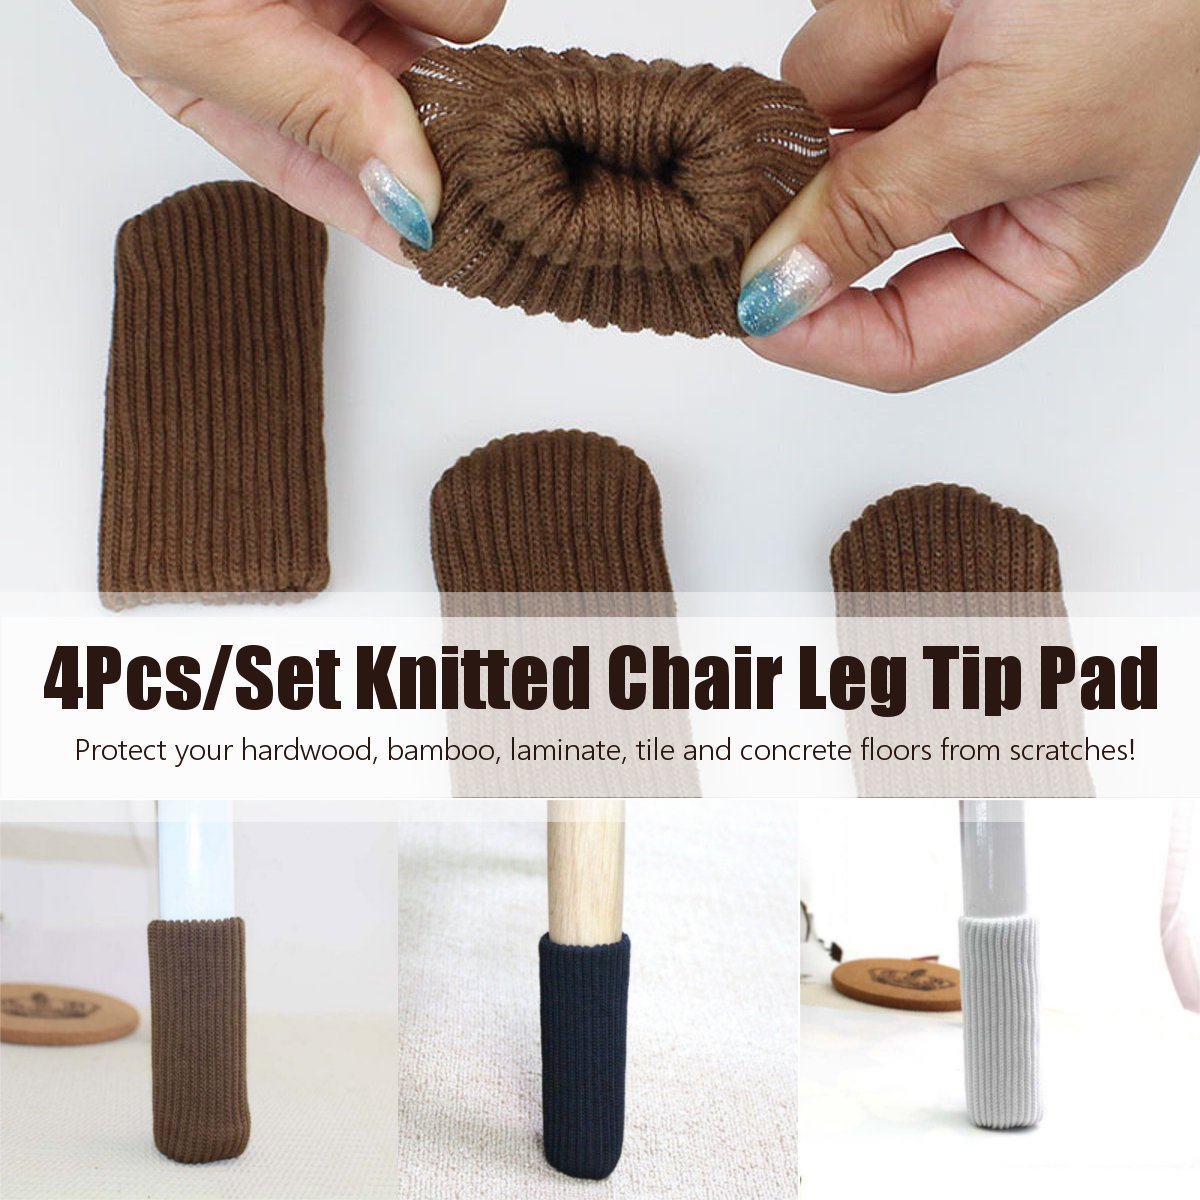 Non-Slip 4PCS Chair Leg Tip Pad Cover Furniture Elastic Sock Floor Protector 3 Colors Table Chair Feet Furniture Accessories